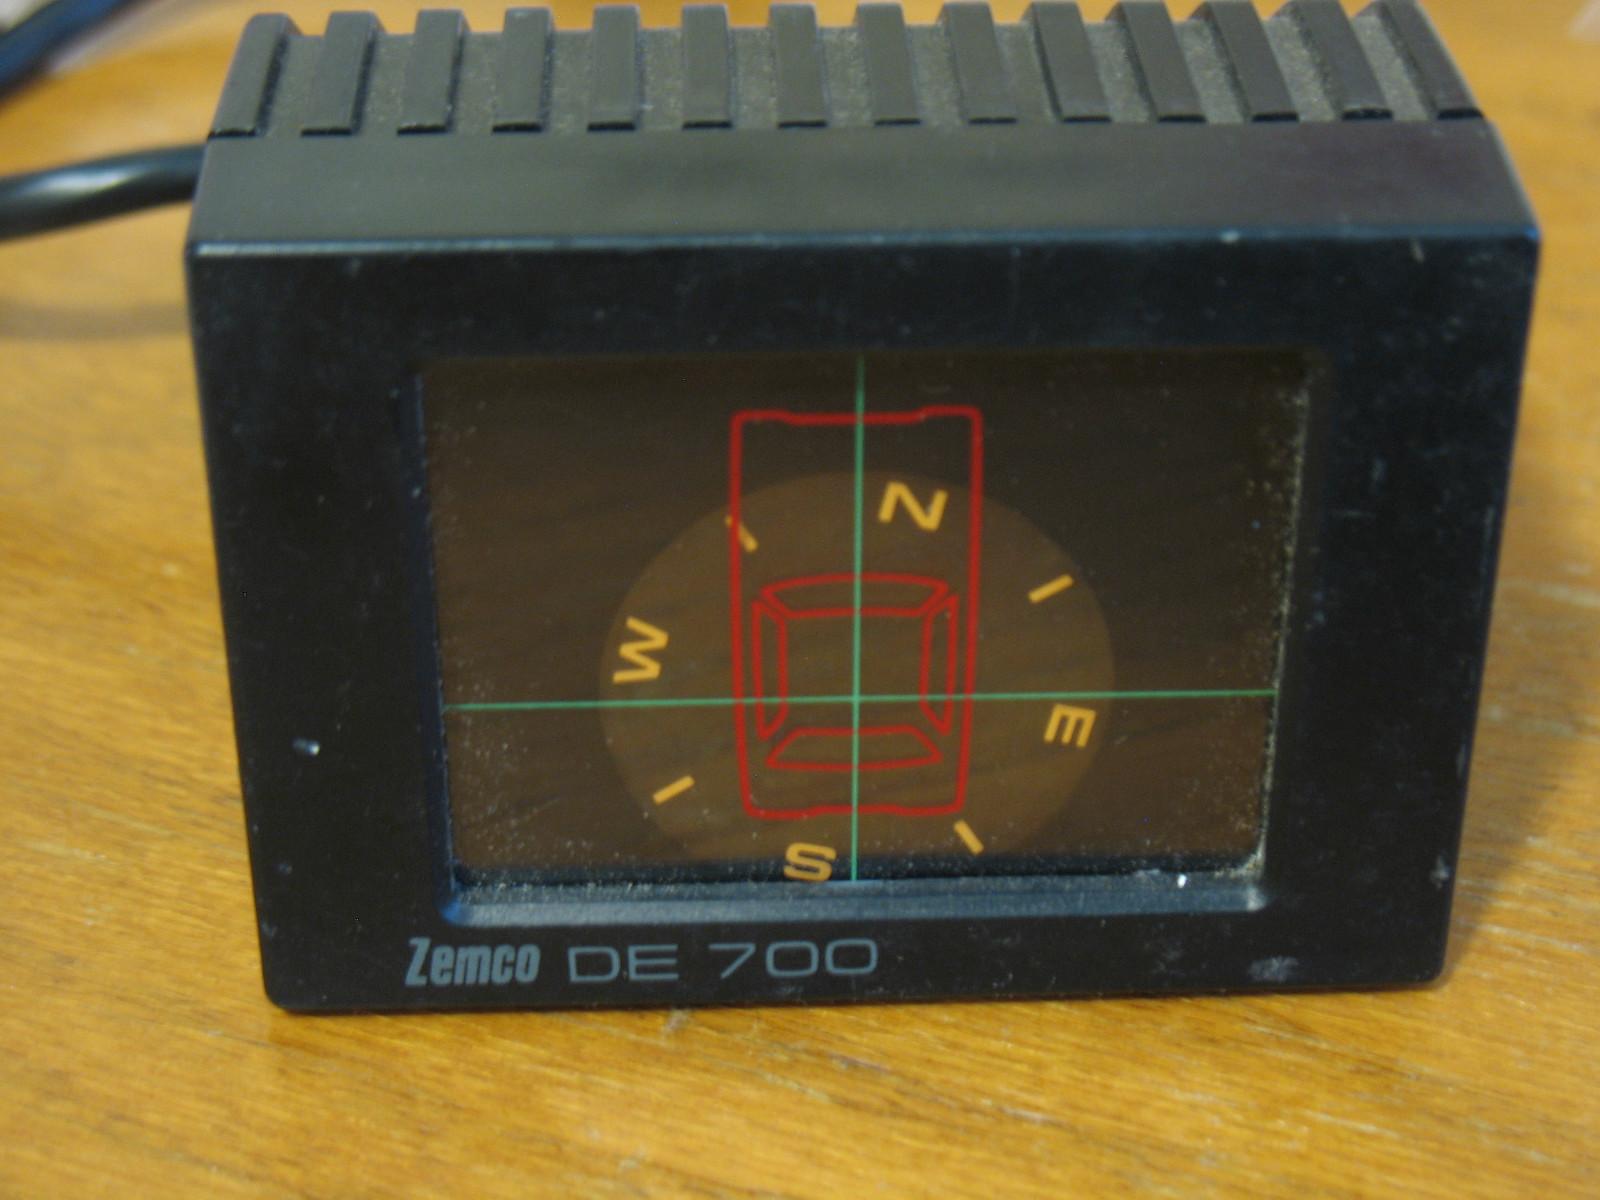 Click image for larger version  Name:Zemco-de700 compass.JPG Views:72 Size:379.7 KB ID:173049